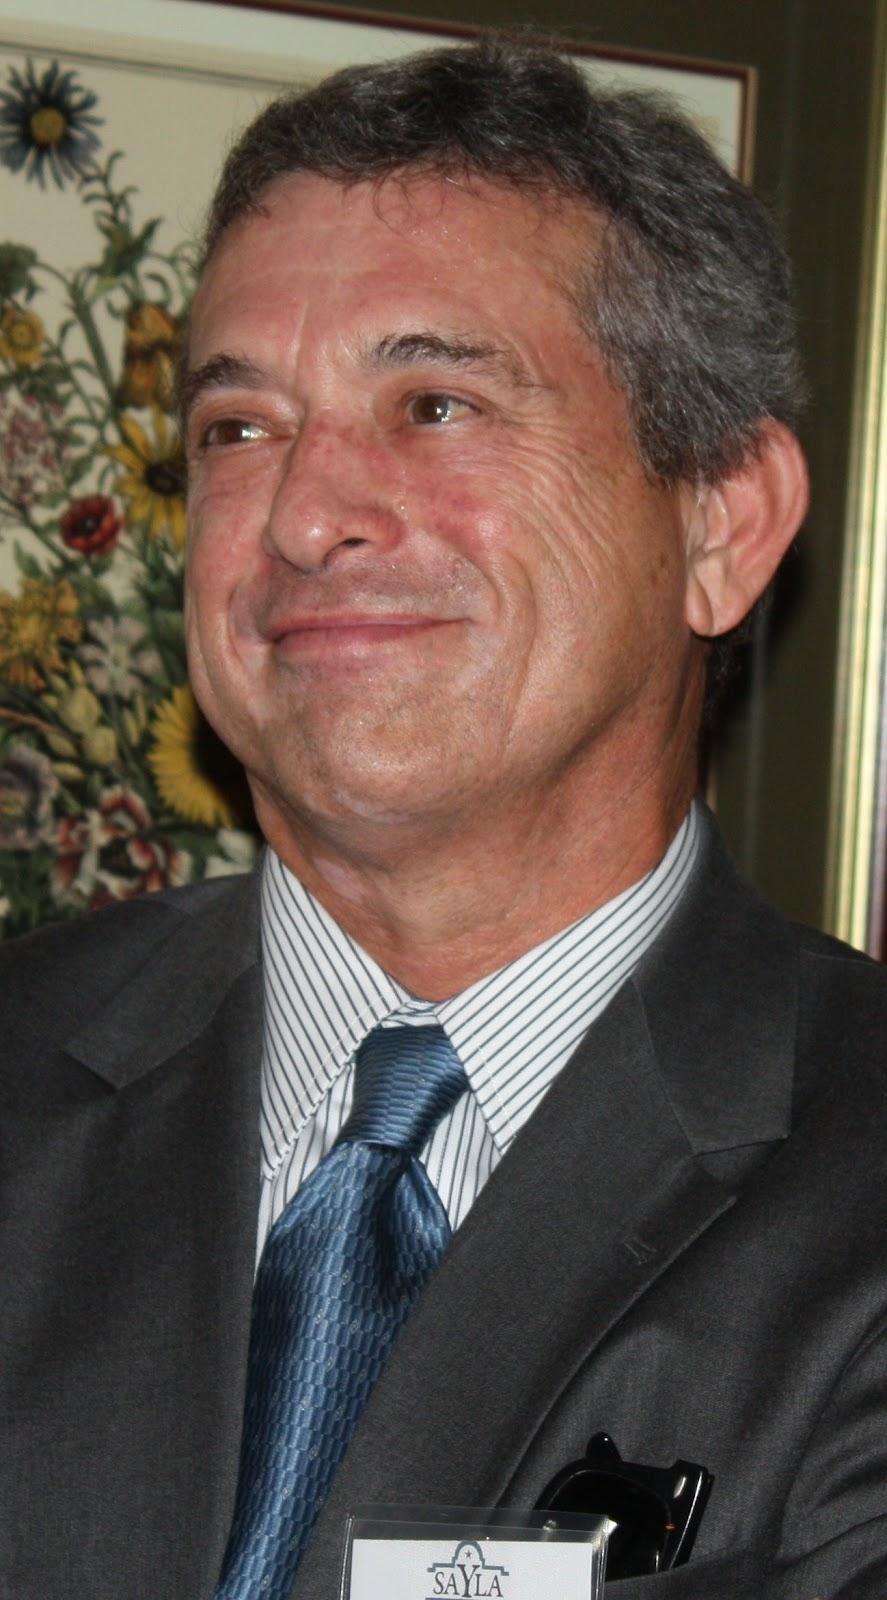 Judge Raymond Jackson